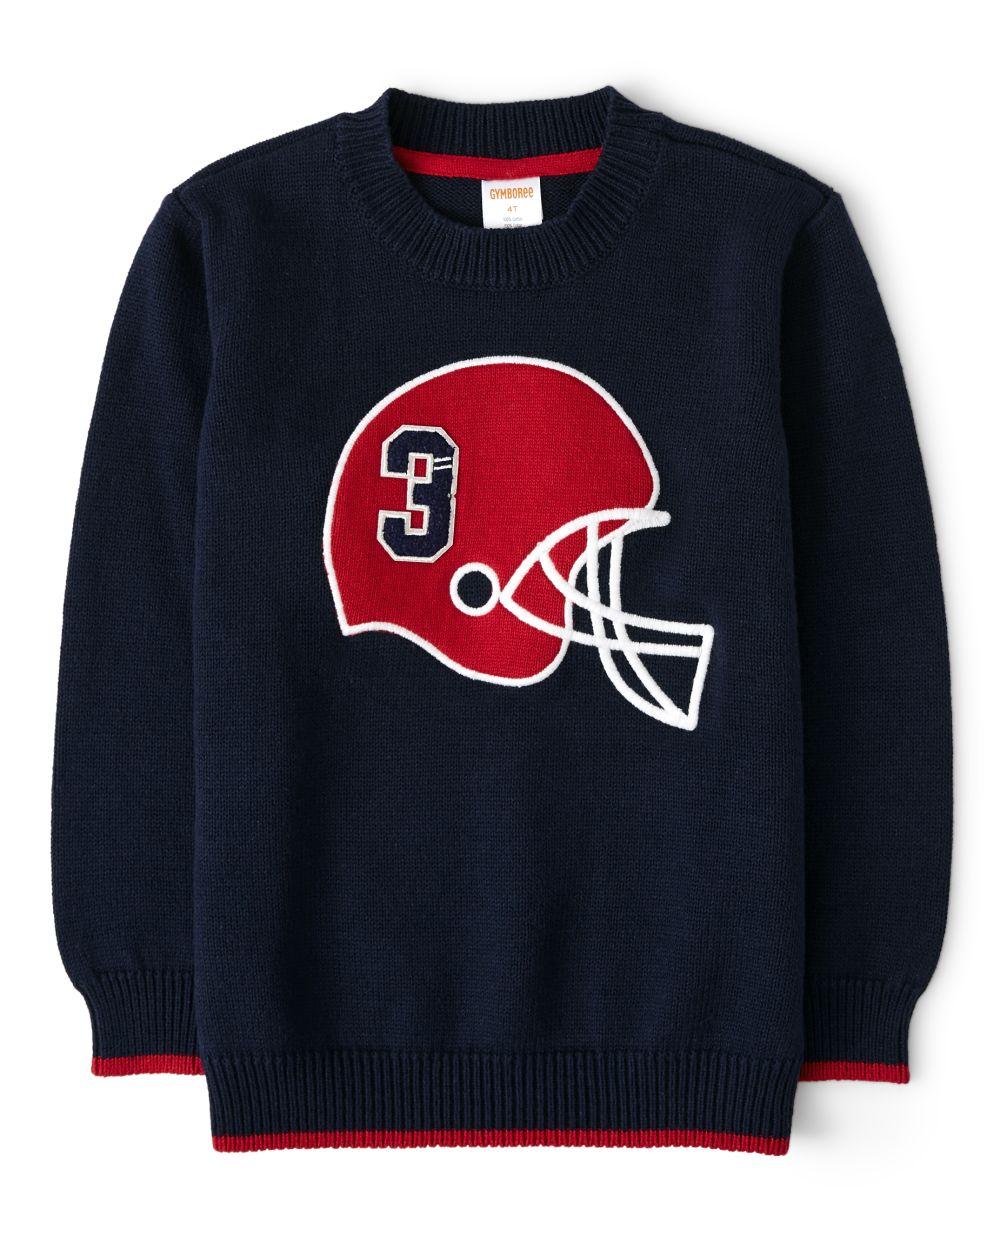 Boys Intarsia Football Sweater - Preppy Puppy